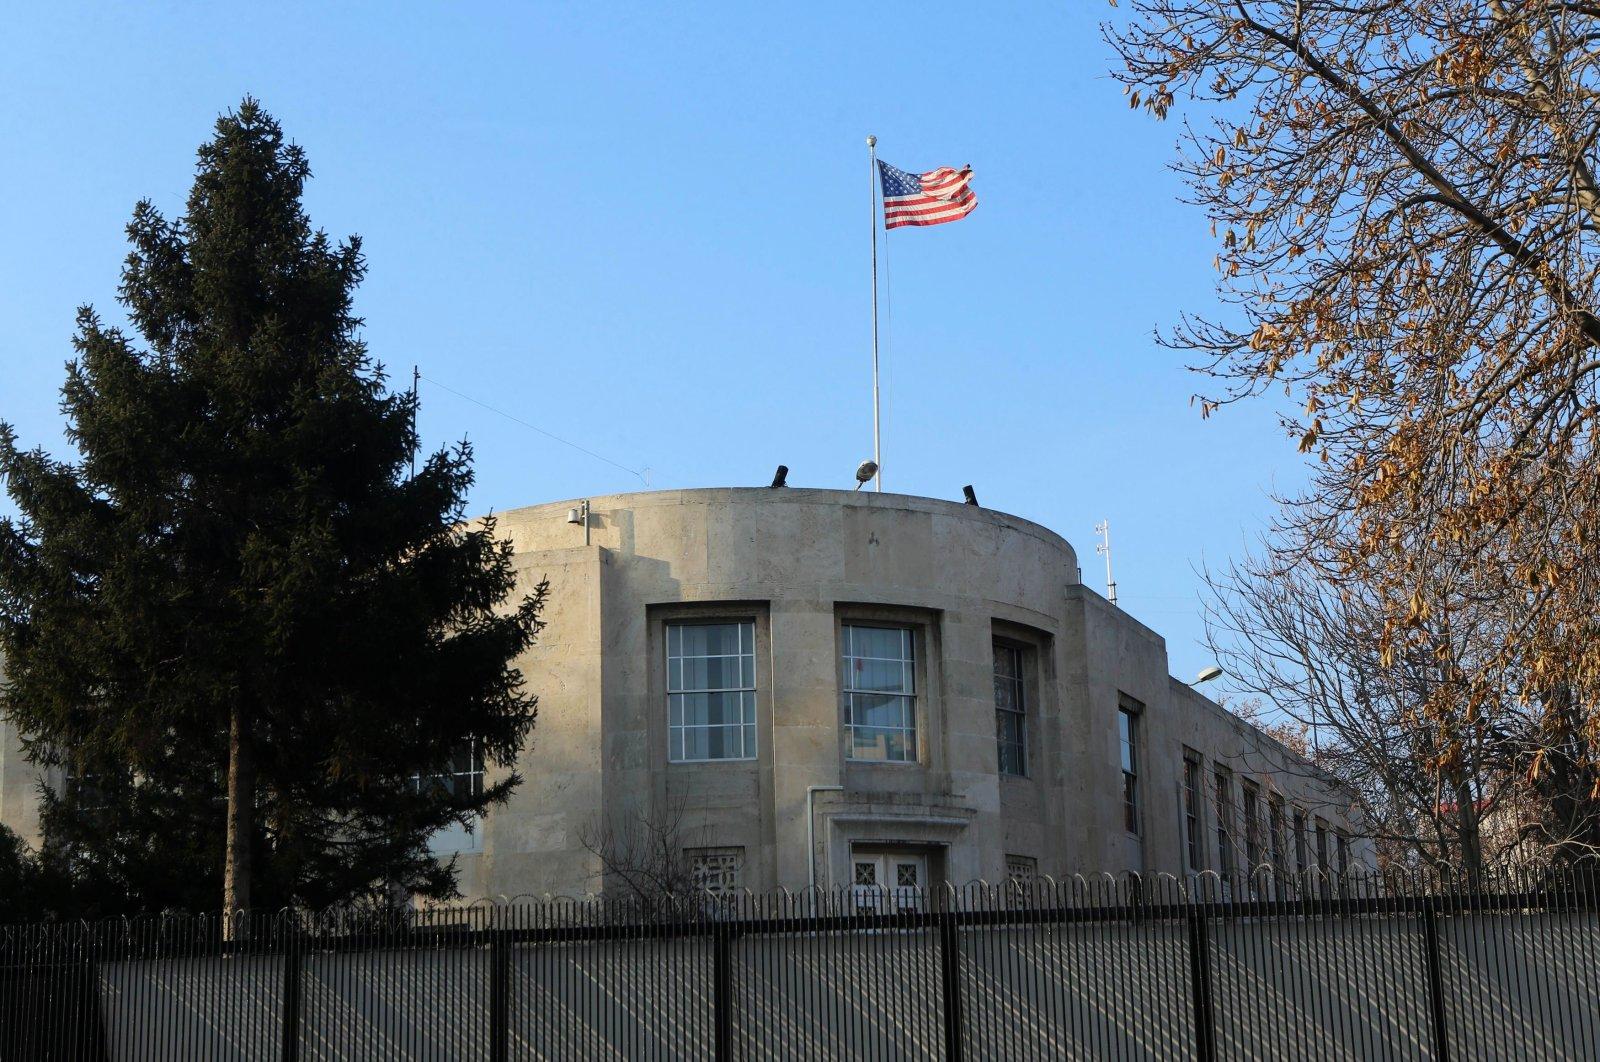 The U.S. Embassy in Ankara, Turkey, is seen on Dec. 20, 2016. (AFP Photo)